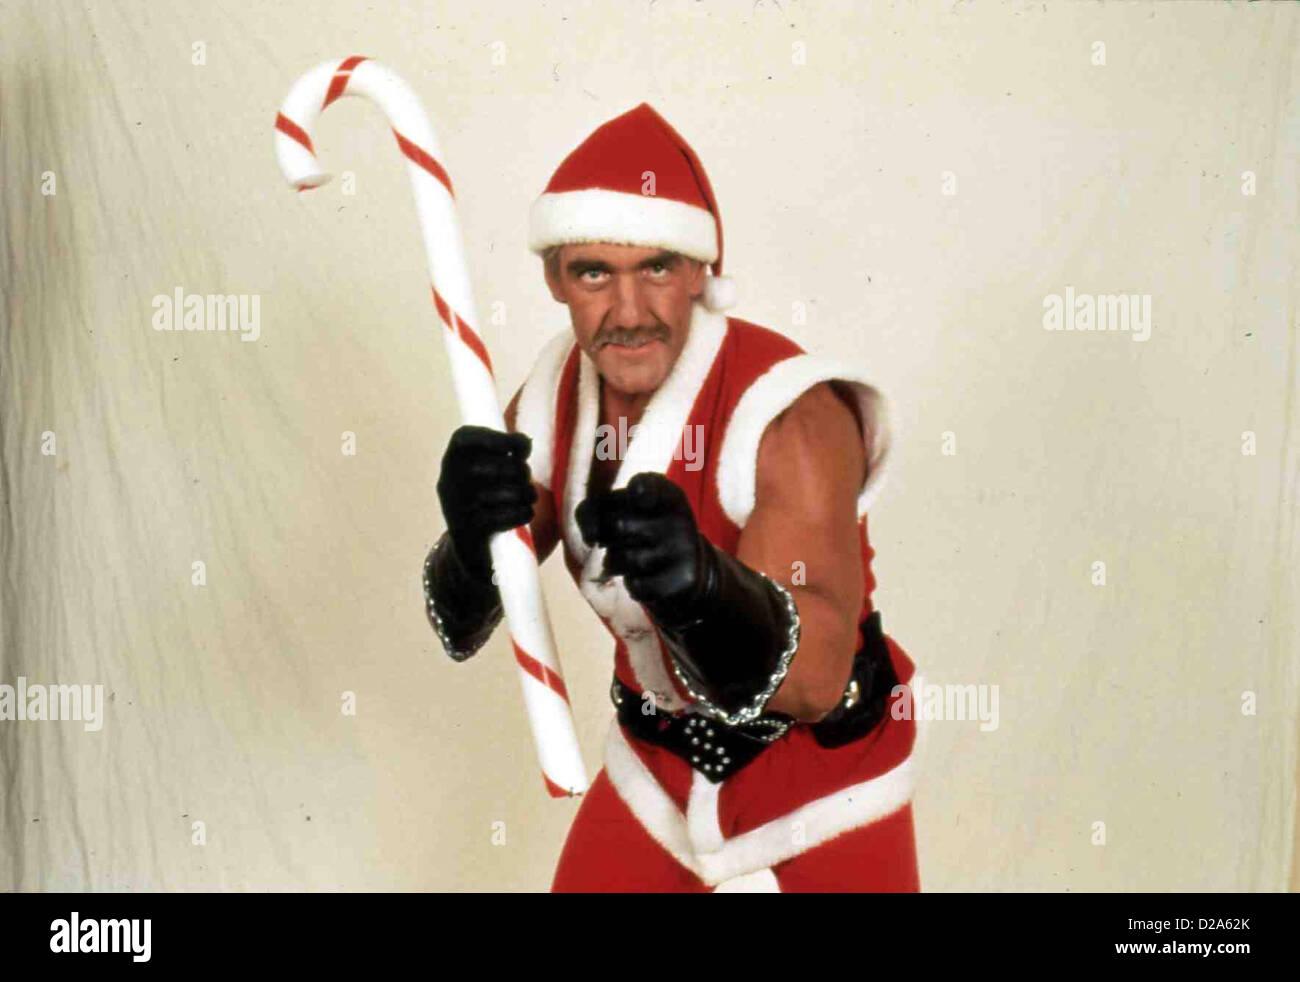 Santa Claus Mit Muckis Santa Muscles Hulk Hogan Millionaer Blake Thorne (Hulk Hogan) wird  sc 1 st  Alamy & Hulk Hogan Stock Photos u0026 Hulk Hogan Stock Images - Page 2 - Alamy